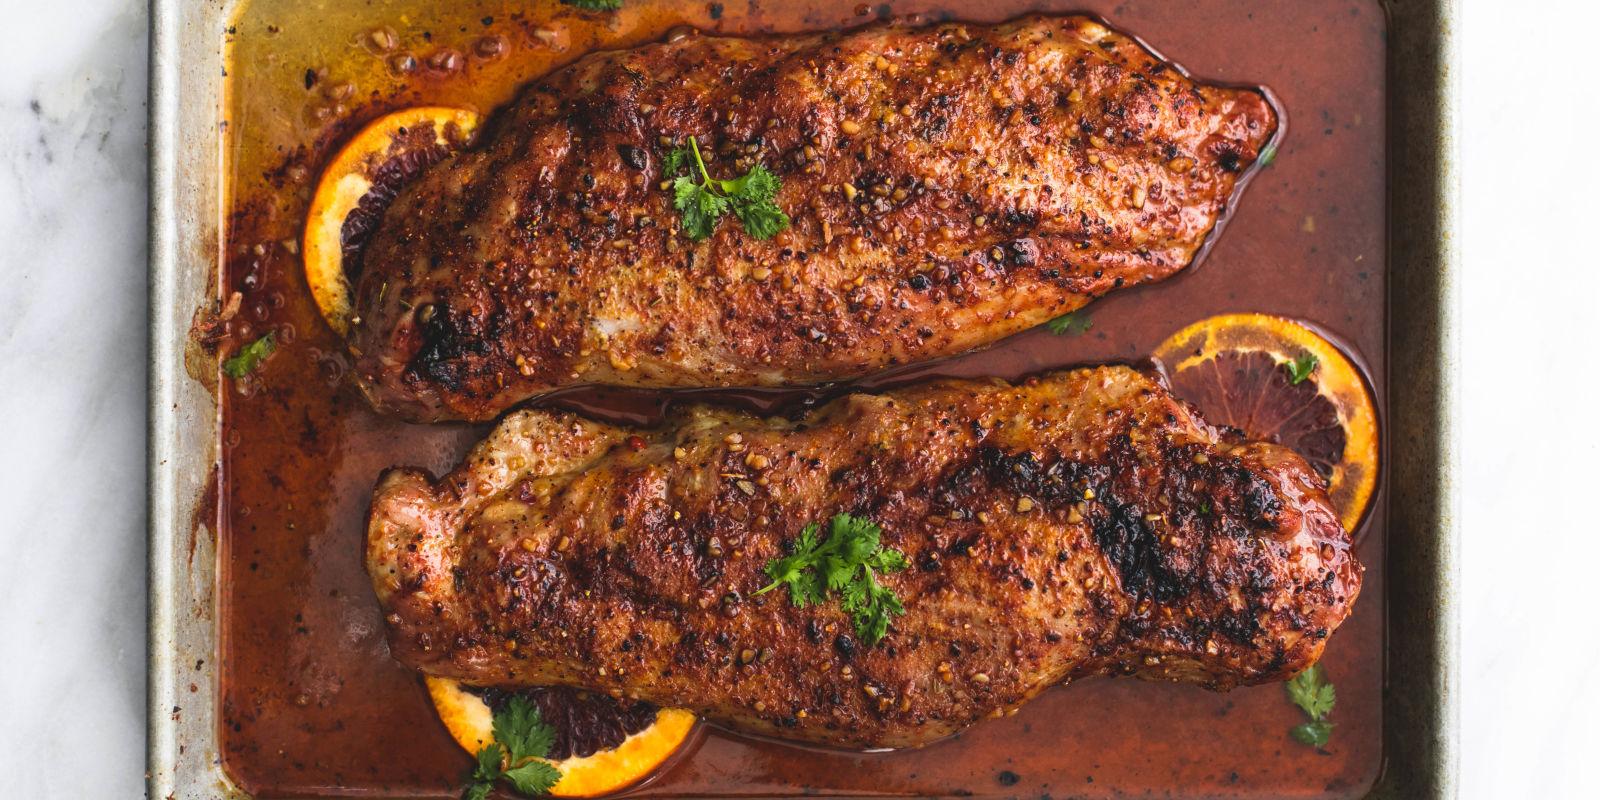 Best Glazed Pork Tenderloin Recipe How To Cook Pork Tenderloin In Oven Delish Com